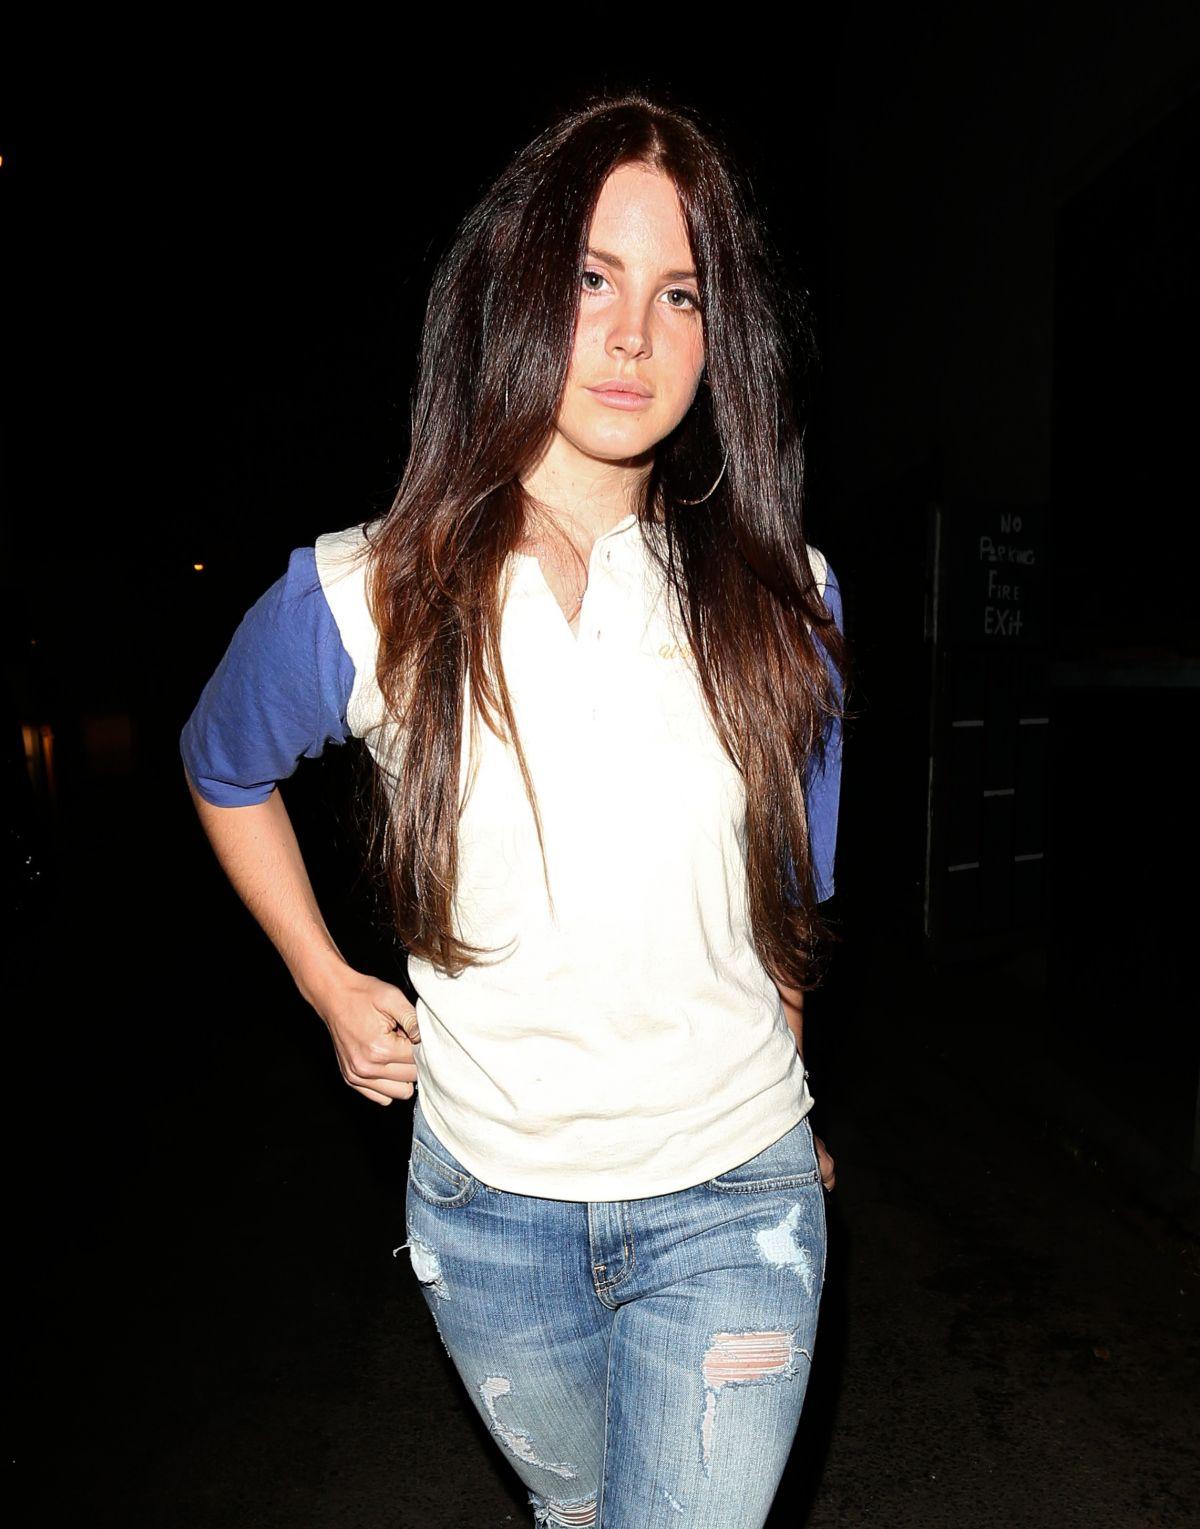 Lana Del Rey By Chris Nicholls For Fashion Magazine: LANA DEL REY Leaves Troubadour Club In Los Angeles